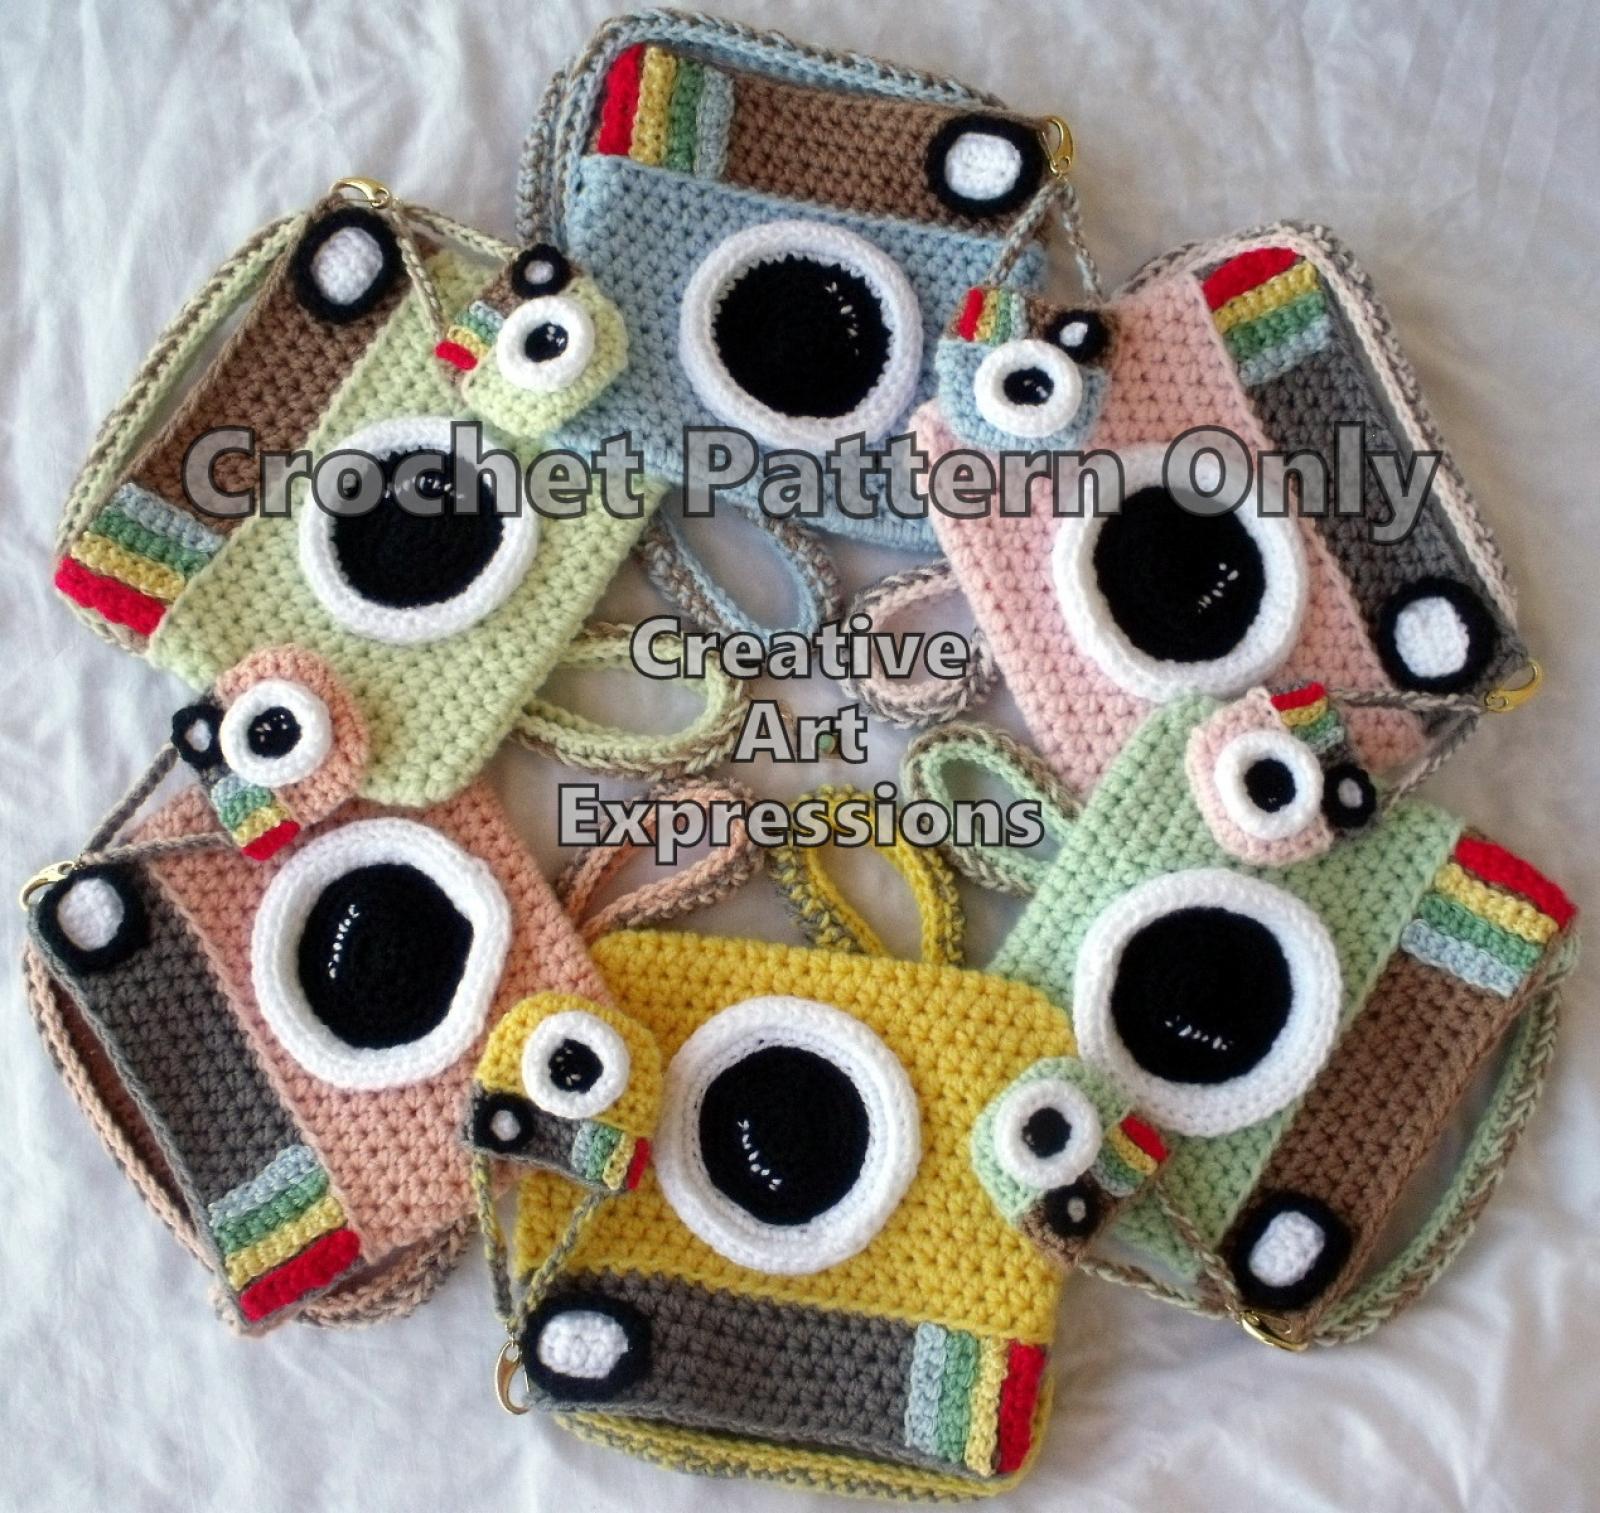 Camera Purse Miniature Crochet Pattern